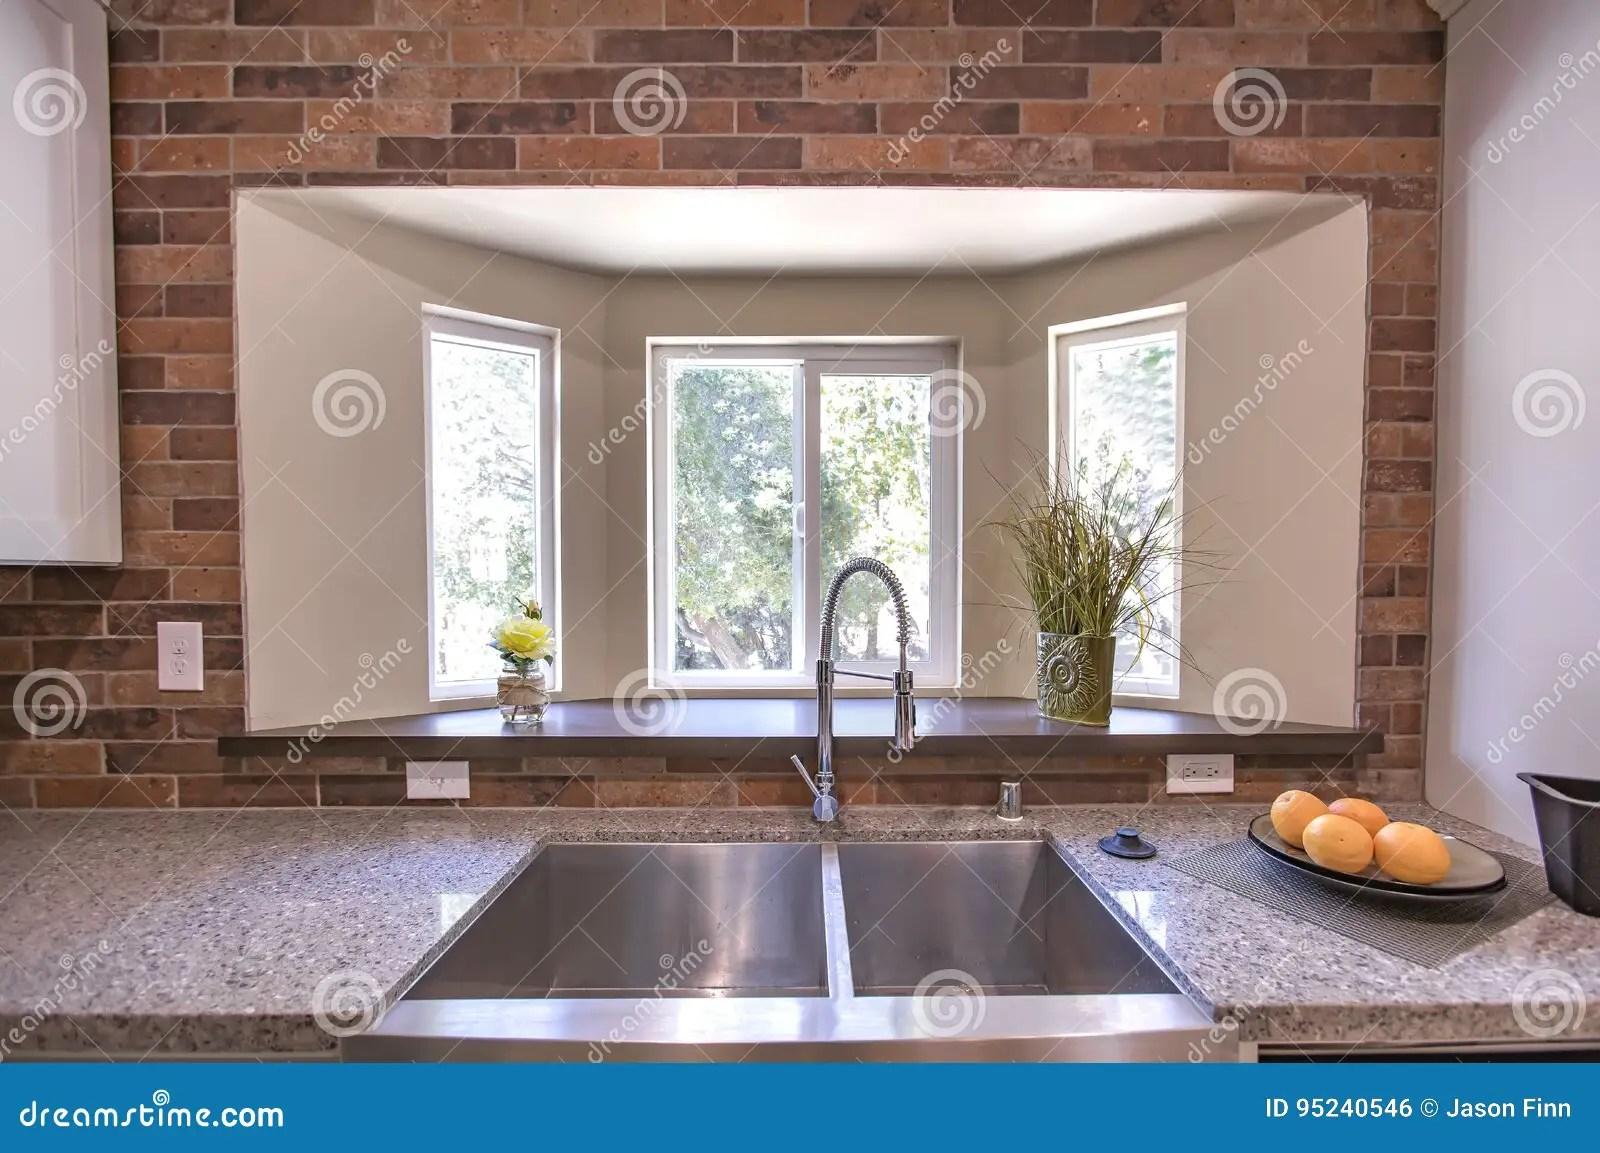 kitchen prep sink rustic island 大农场样式与砖的厨房水槽在加利福尼亚样房房地产库存照片 图片包括有 大农场样式与砖的厨房水槽在加利福尼亚样房房地产